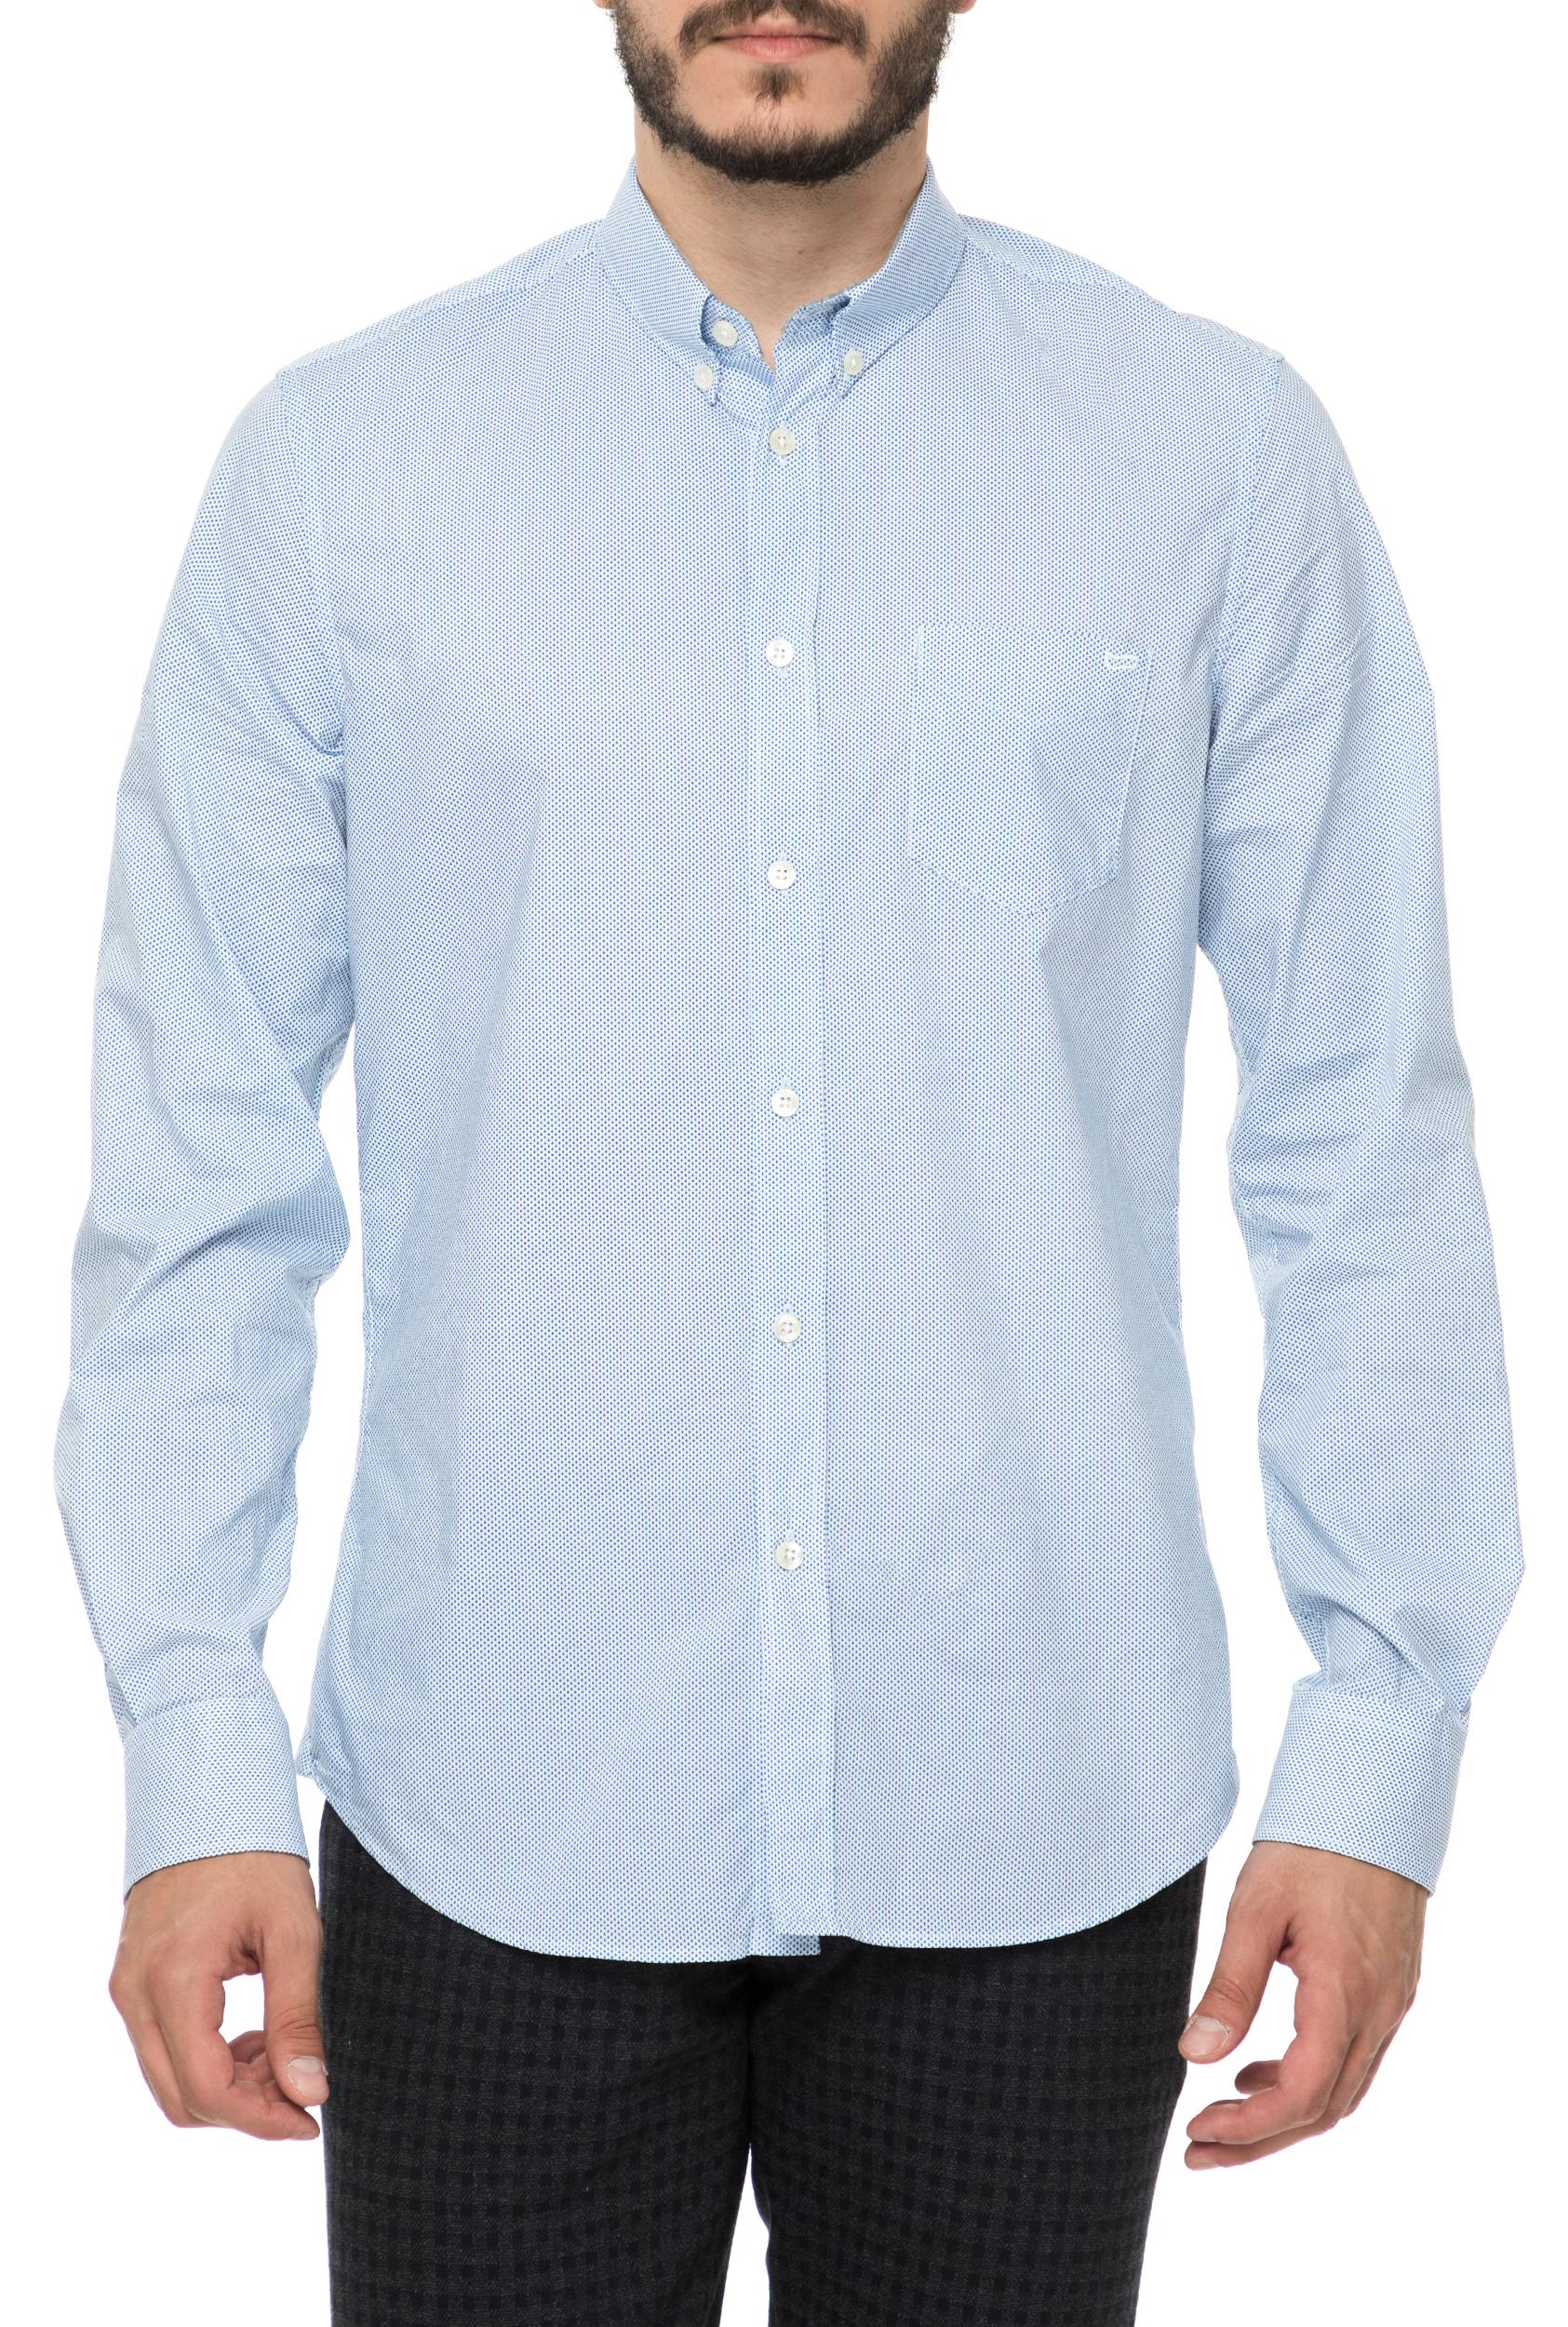 aa12cd98dc53 CollectiveOnline GAS - Ανδρικό μακρυμάνικο πουκάμισο GAS γαλάζιο